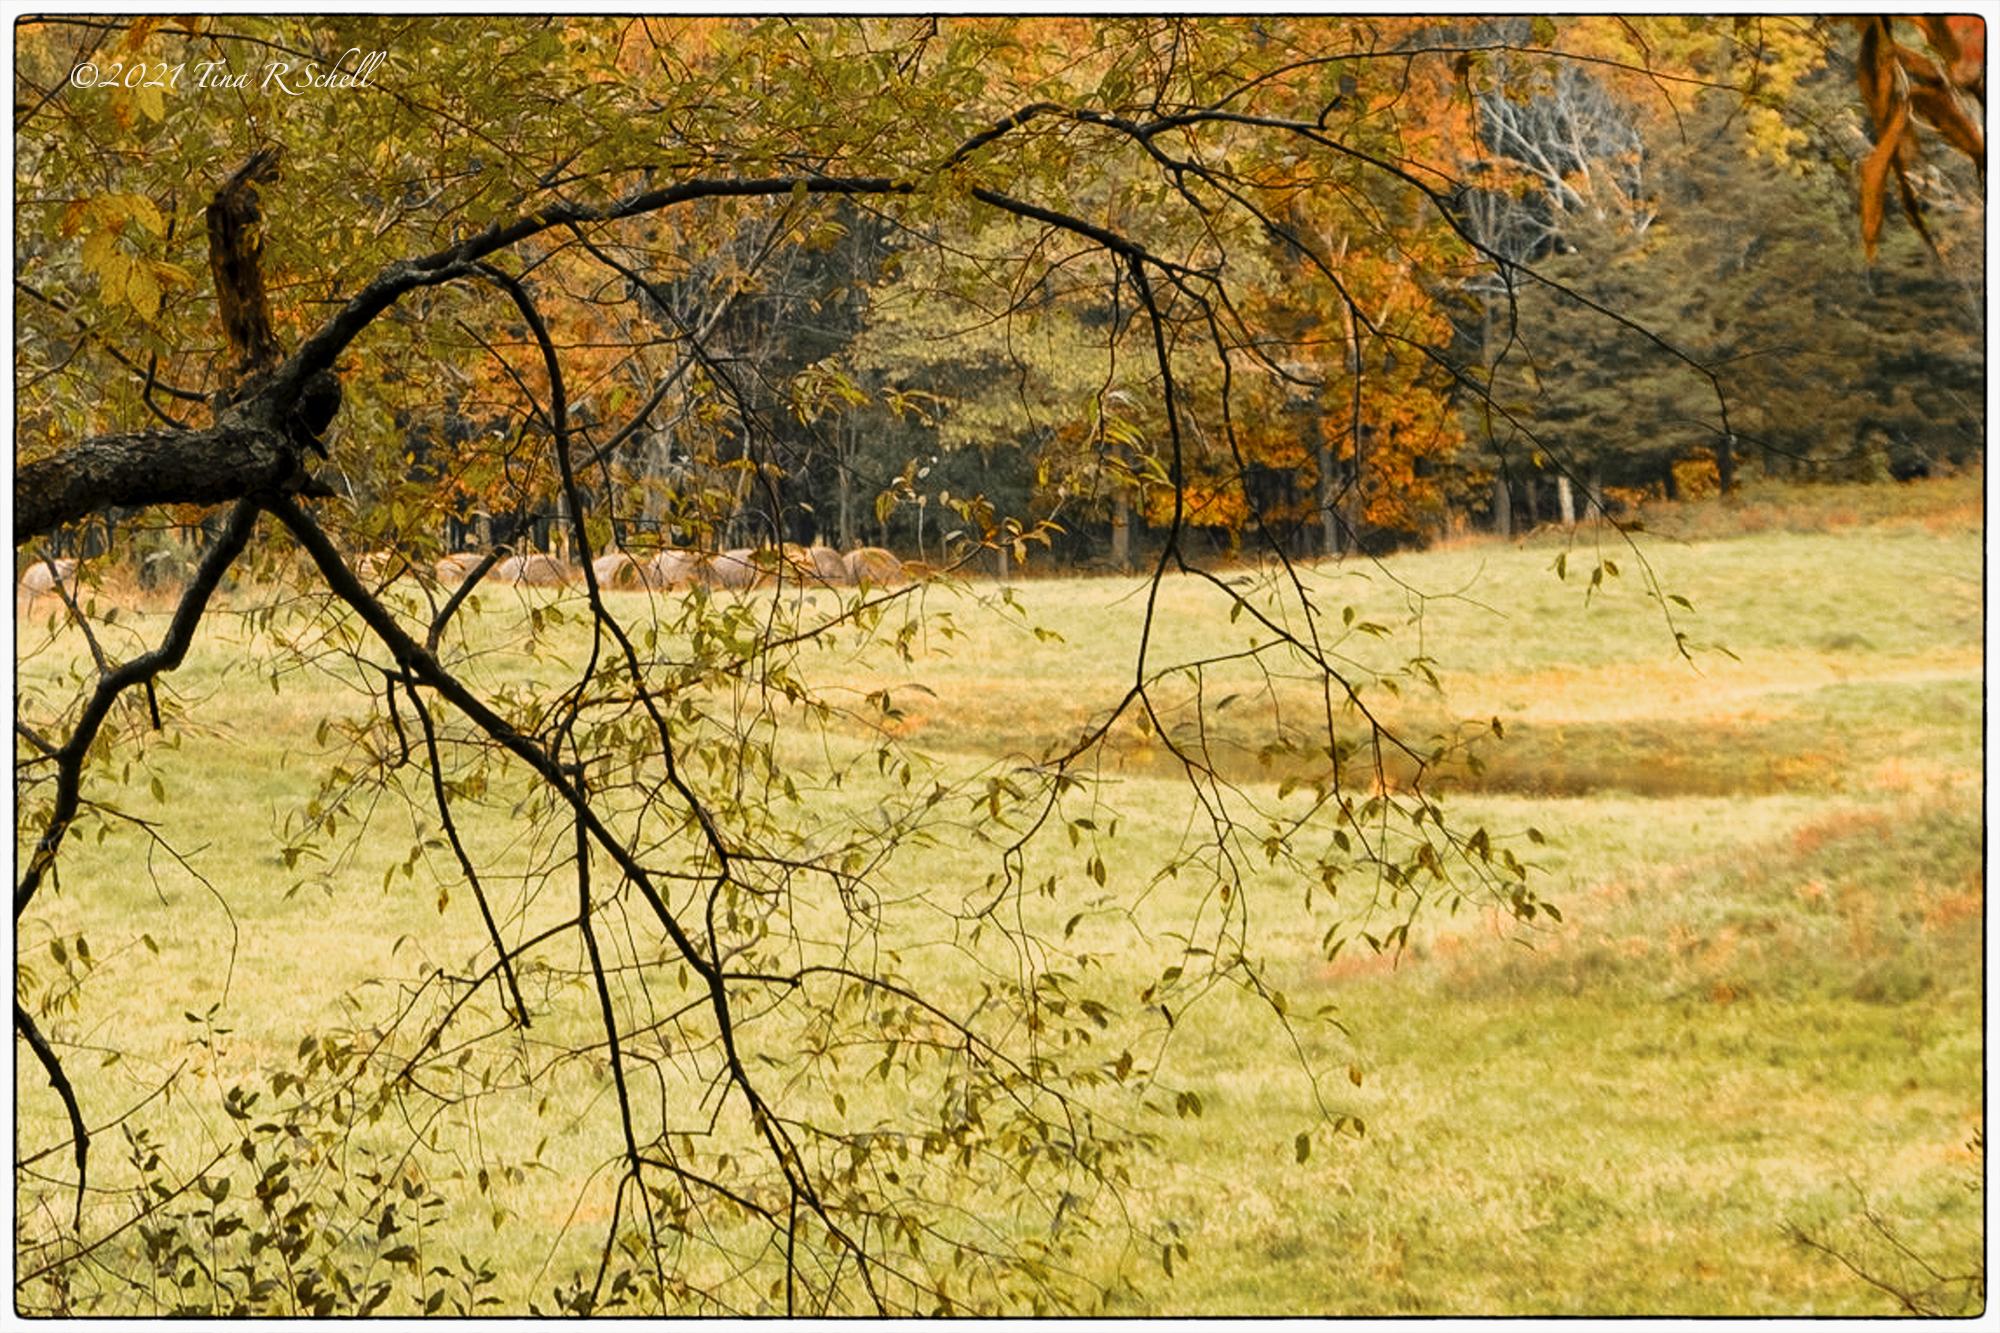 Autumn, New York state, hay bales